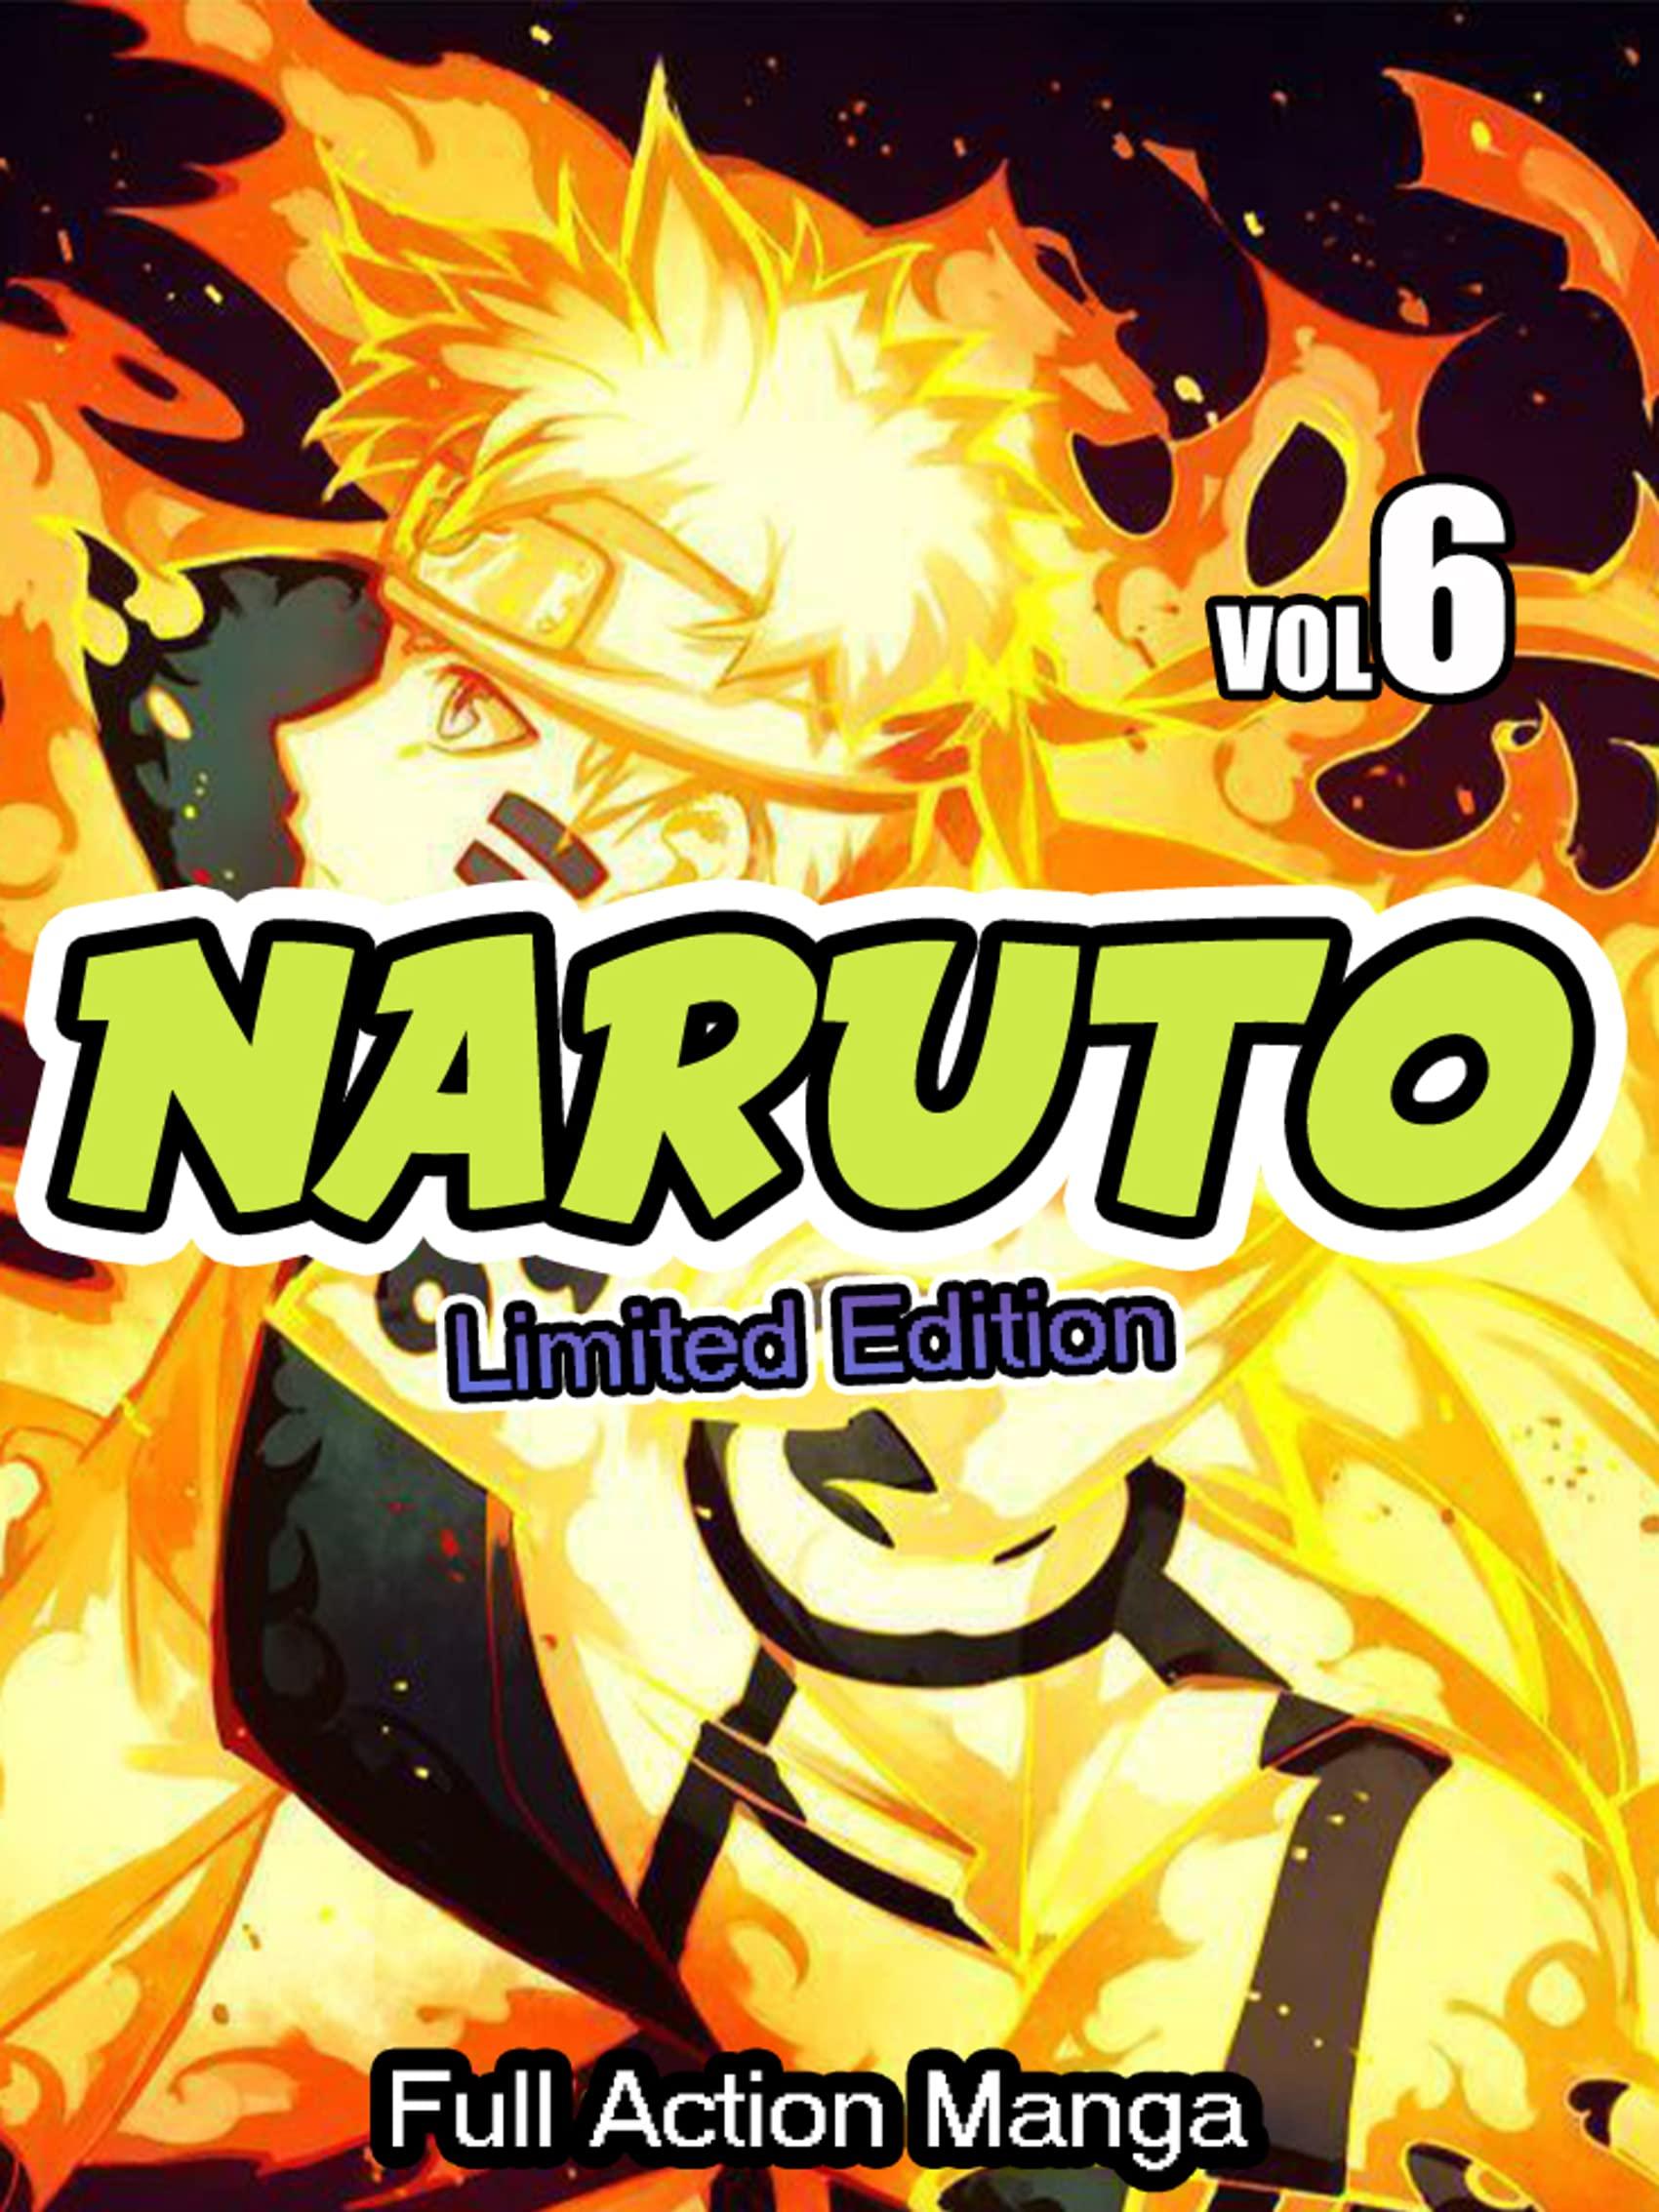 Full Action Manga Naruto Complete Series: Limited Edition Naruto Vol 6